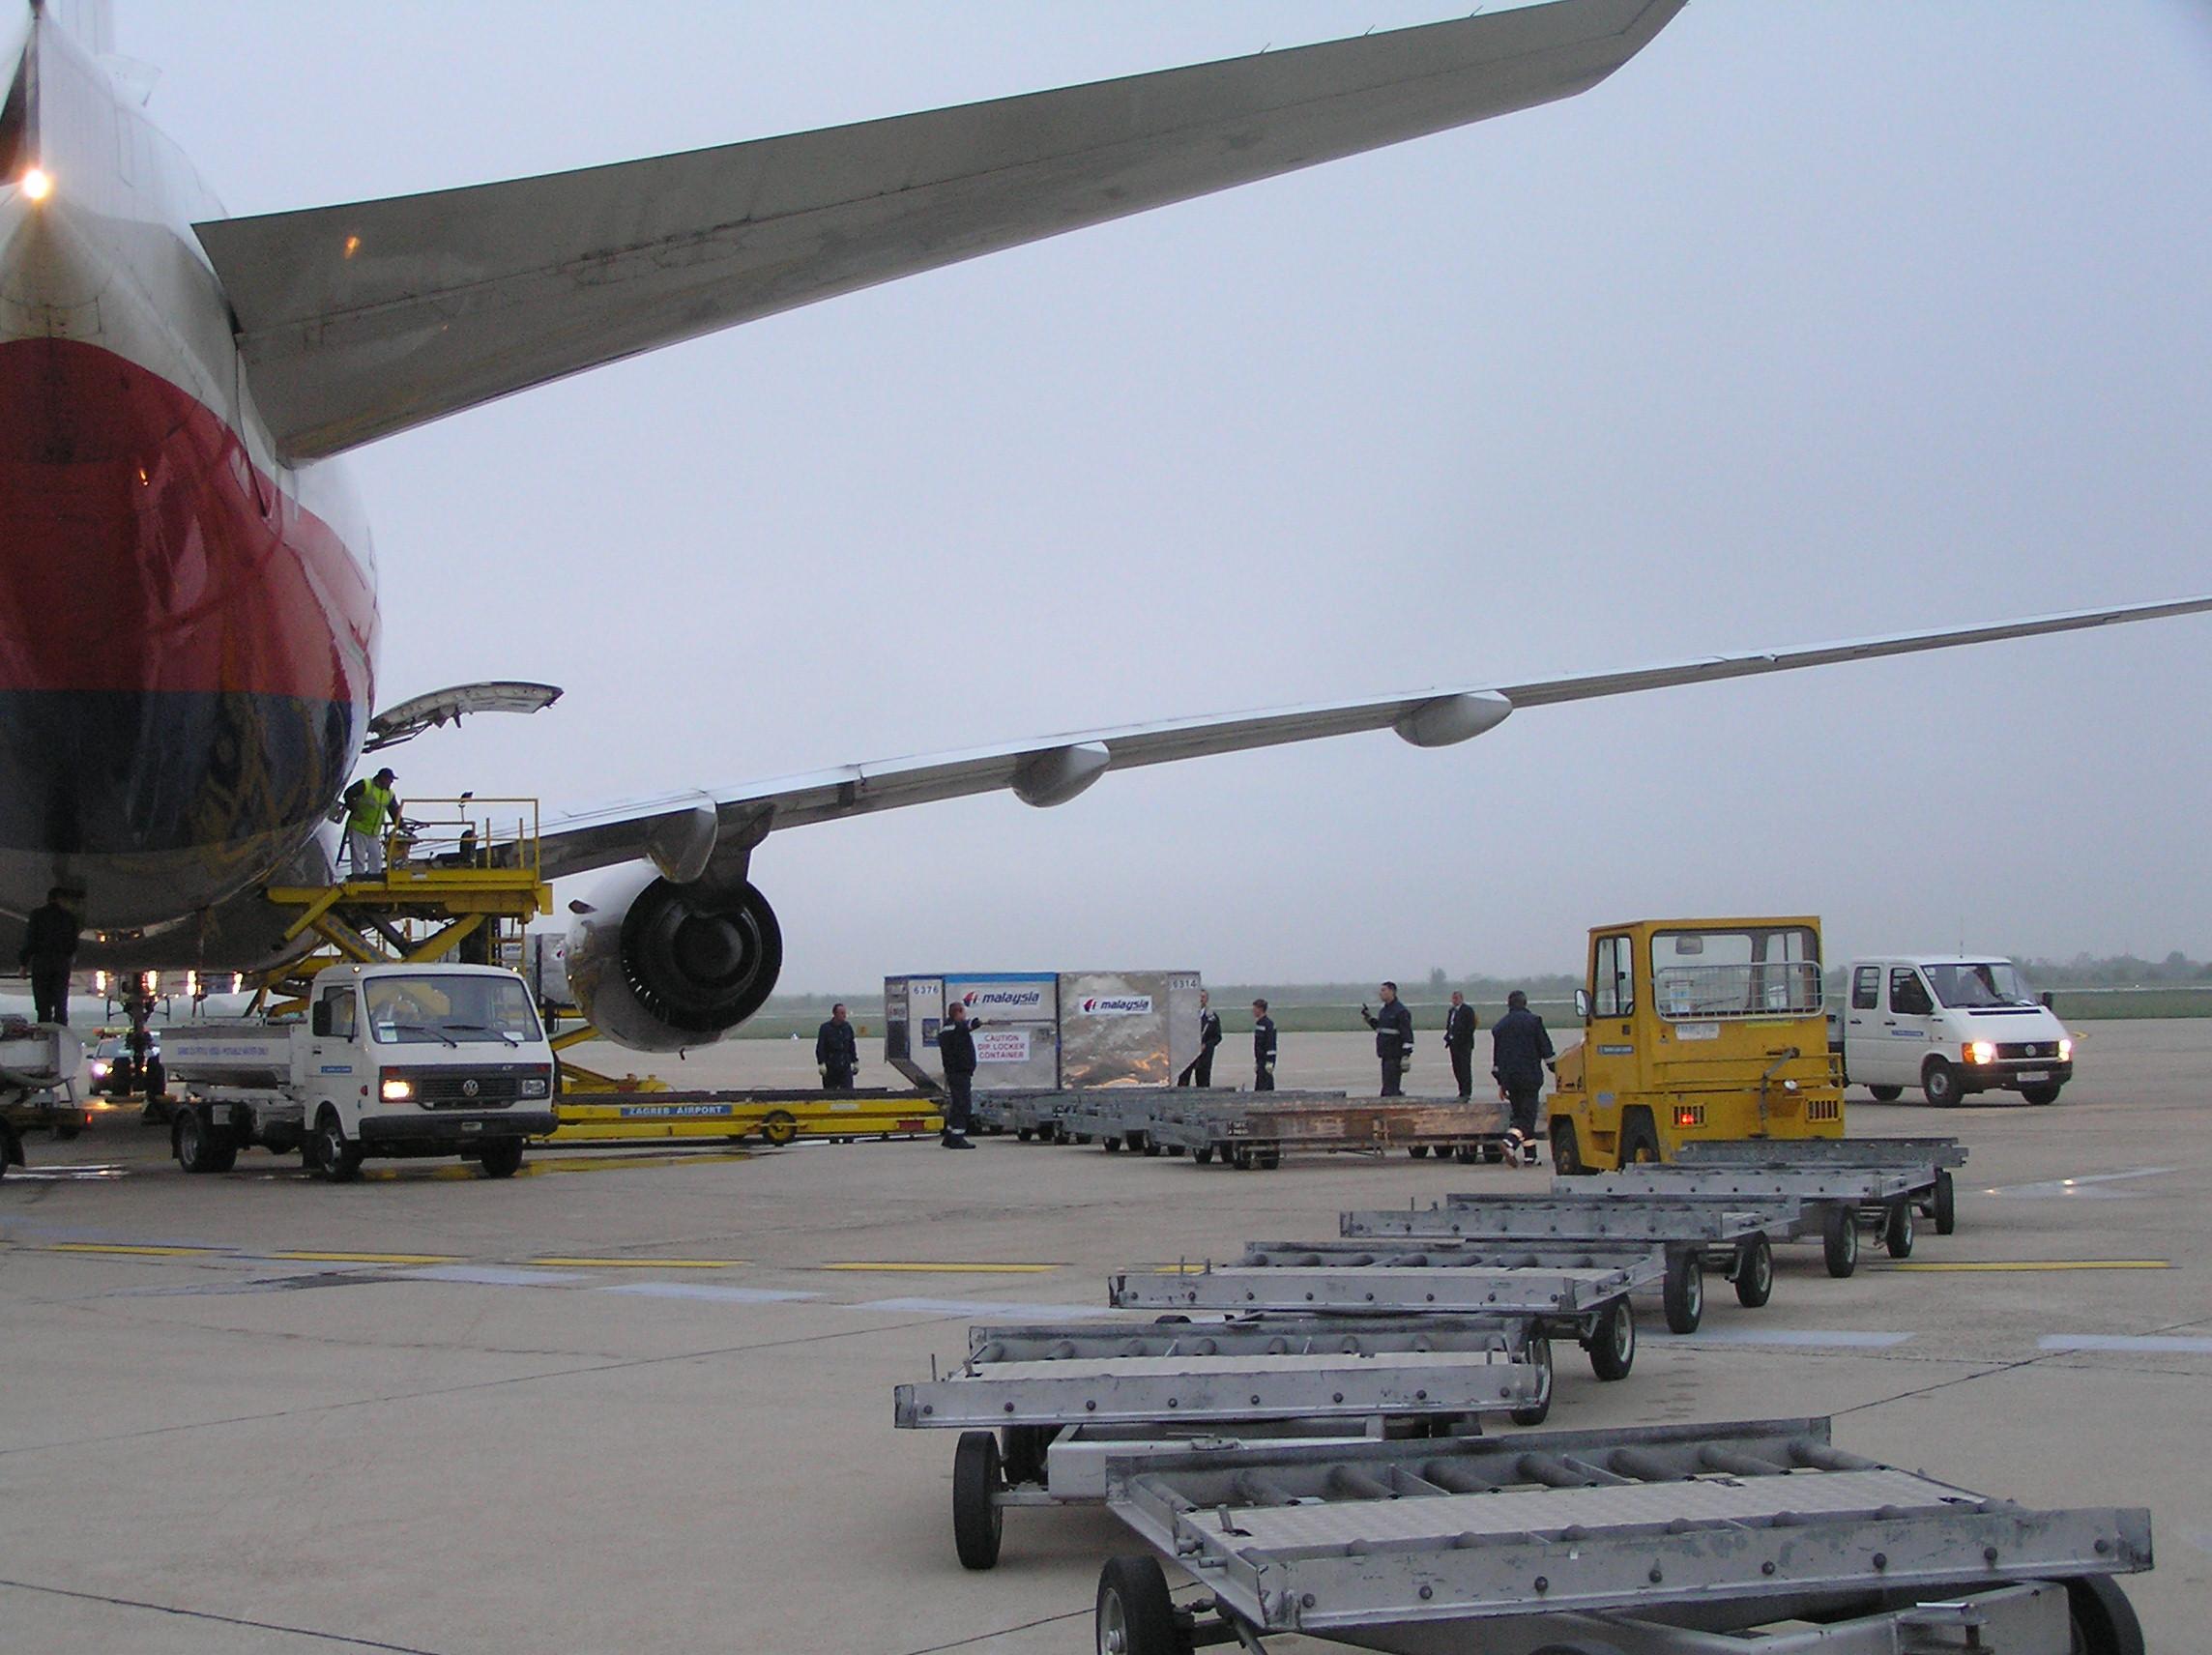 us army technical manual aviation unit maintenance avum and aviation intermediate maintenance avim manual for general aircraft maintenance electrical volume 4 tm1 1500 204 23 4 1992